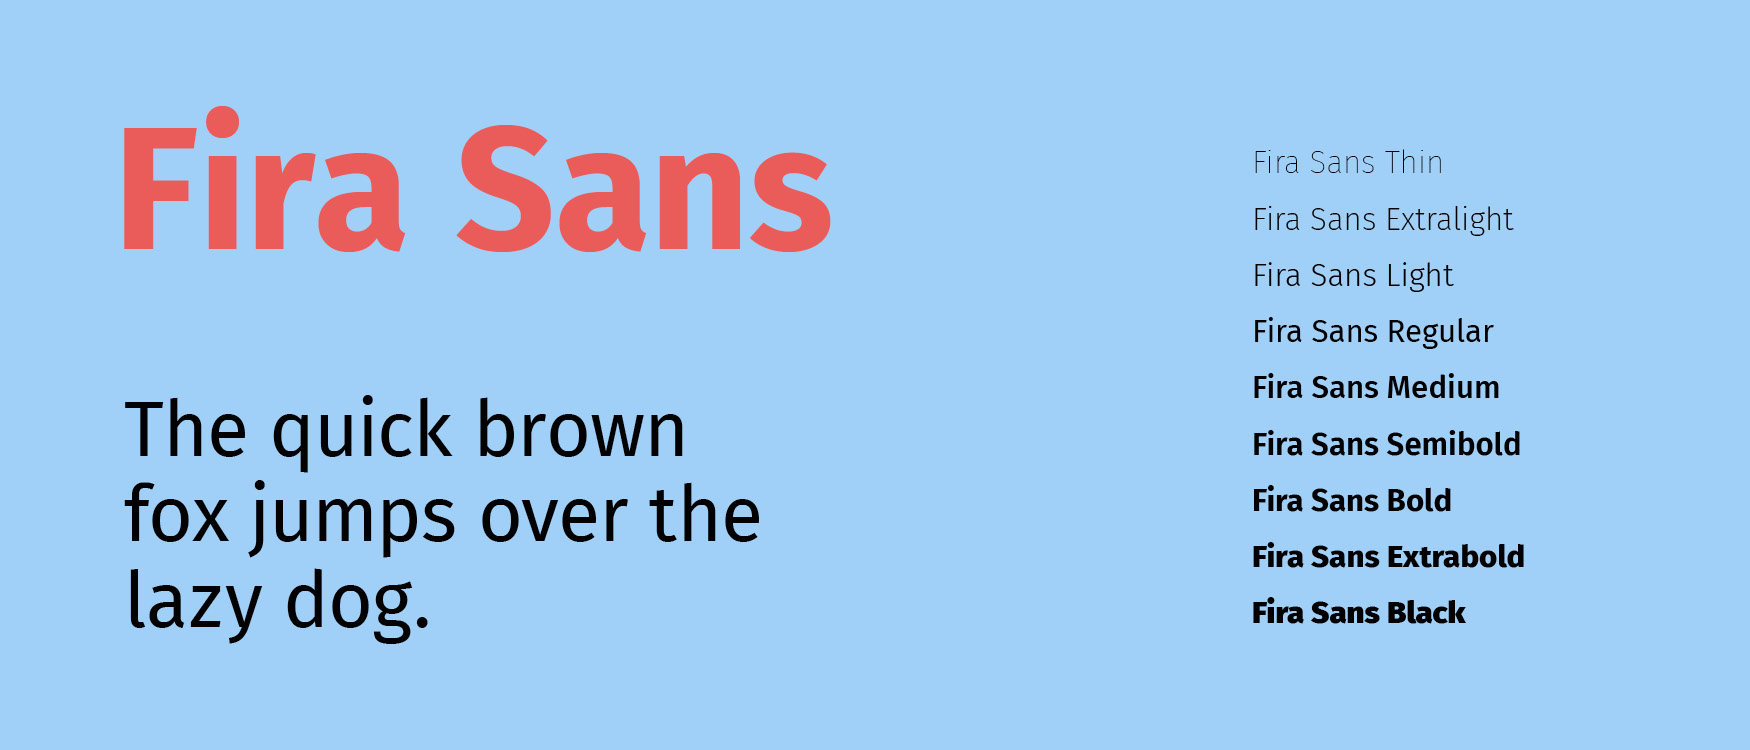 Fira Sans Google Fonts Mobile Fonts UI